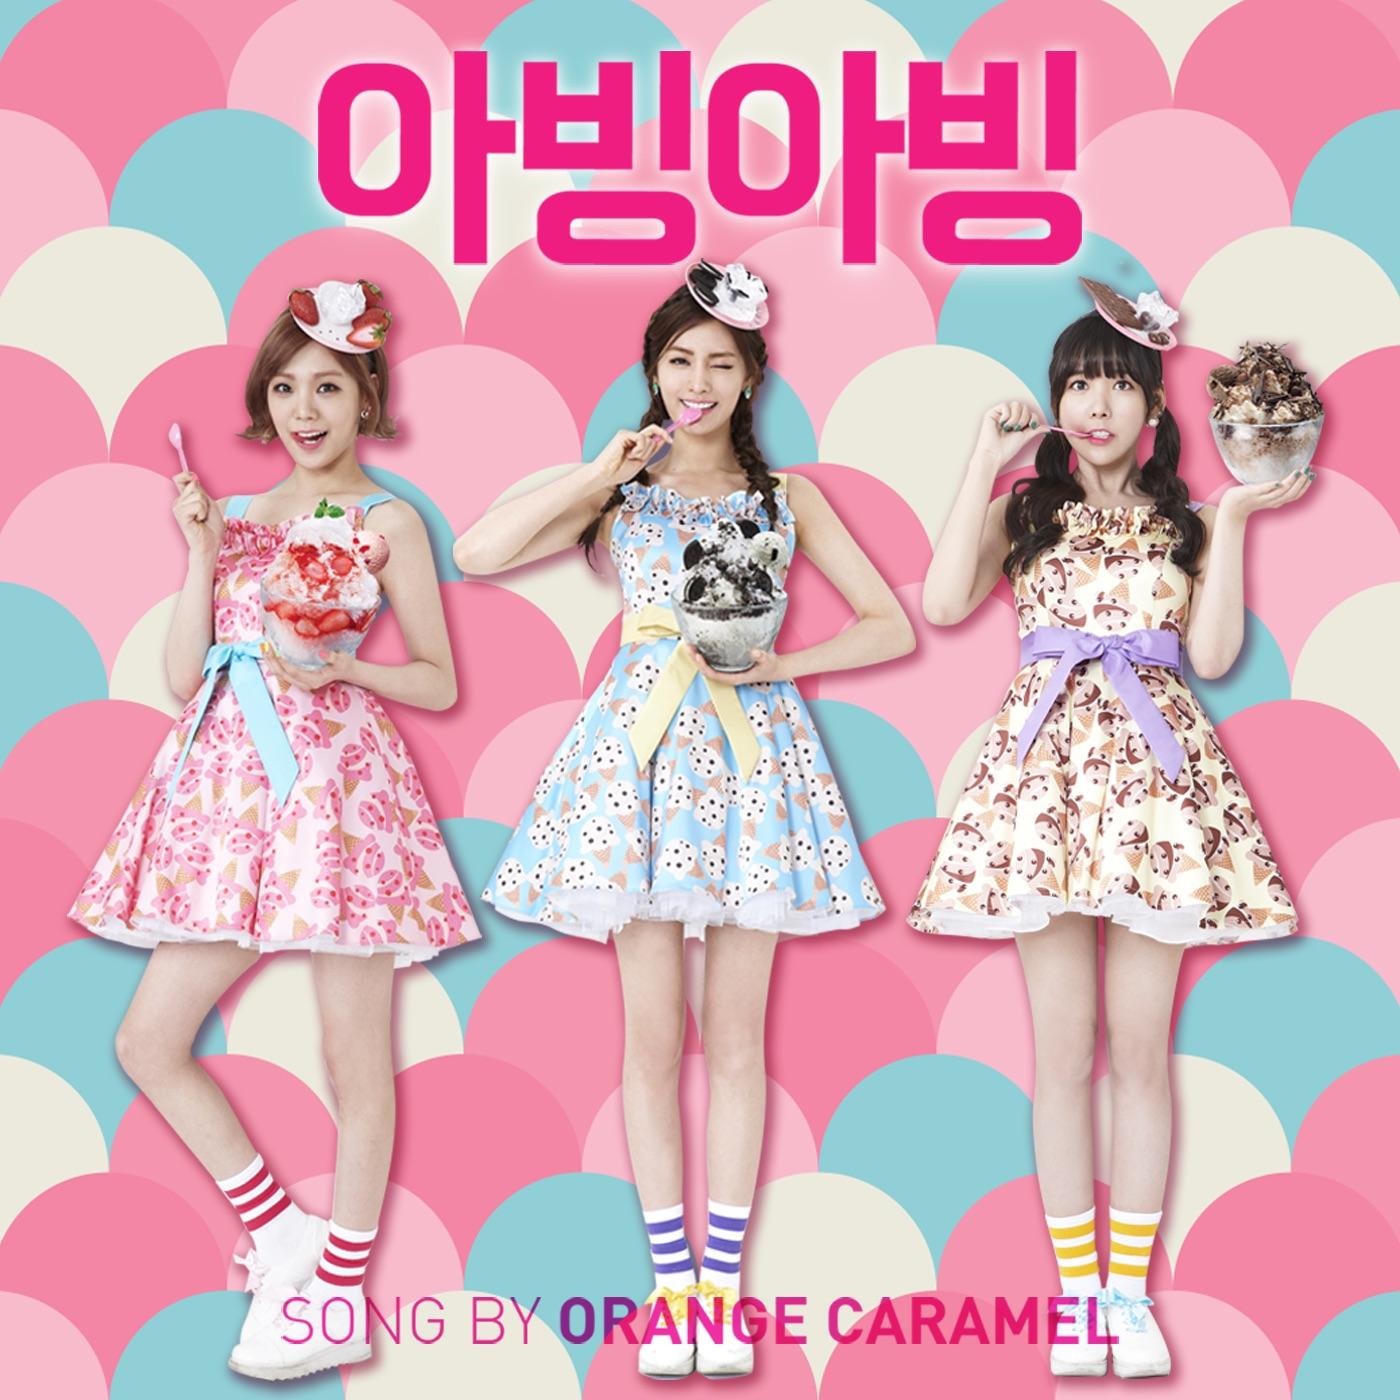 Orange Caramel - 아빙아빙 Abing Abing - Single